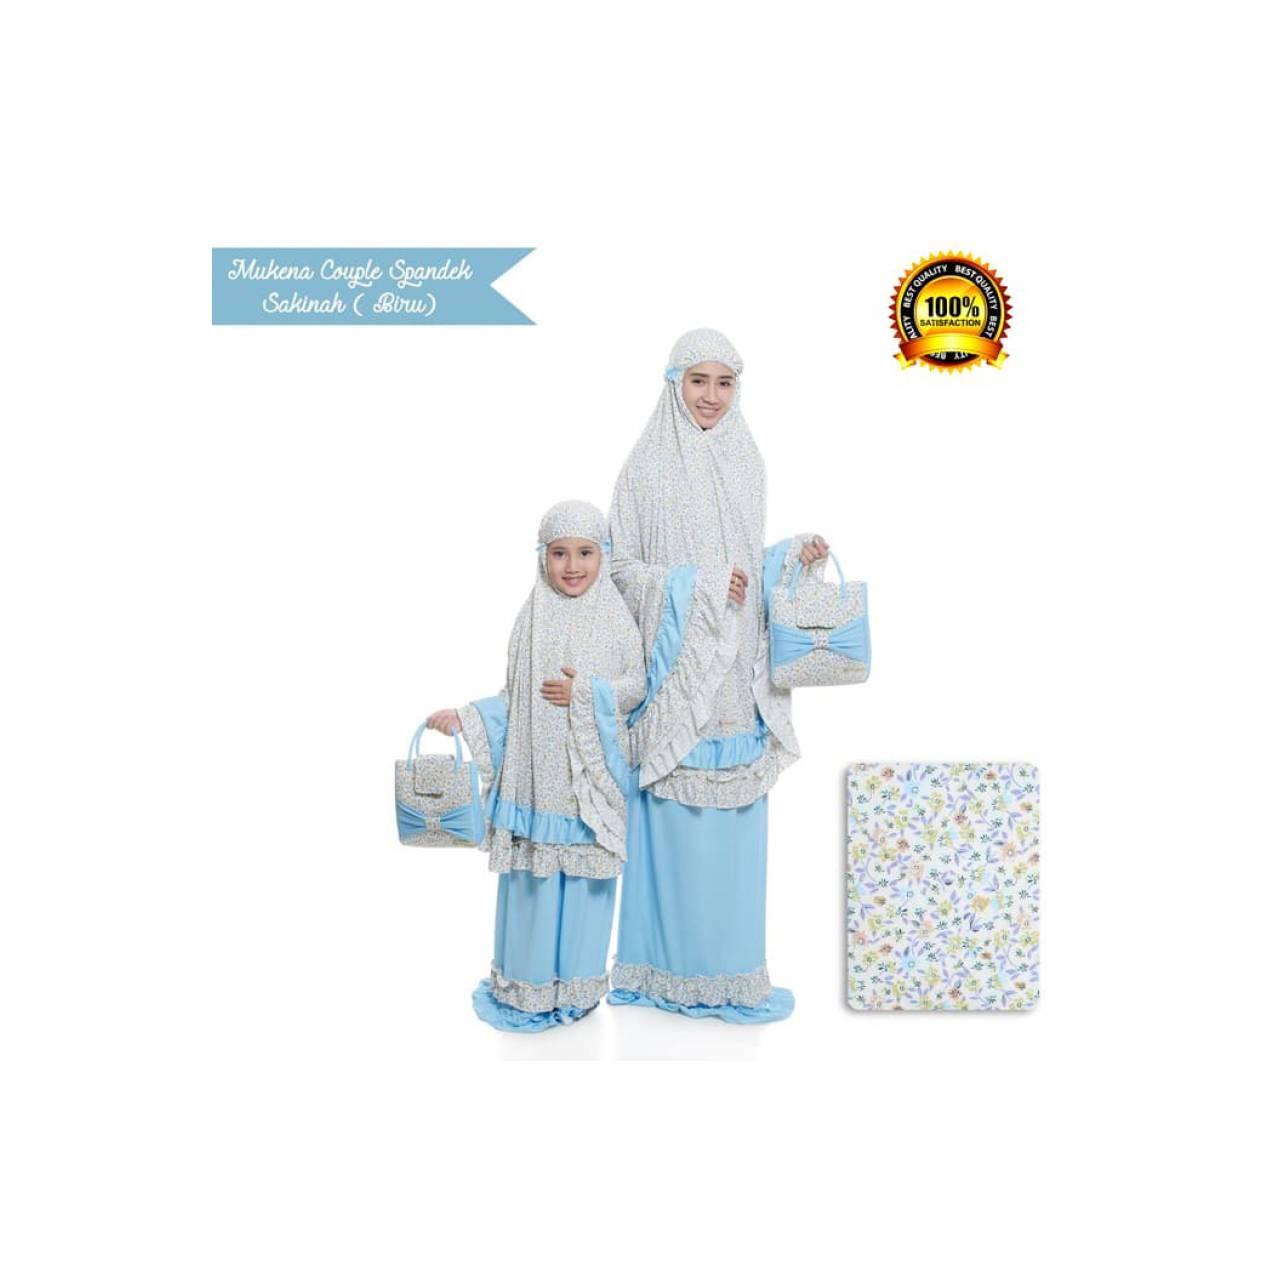 Mukena Couple Ibu dan Anak BIRU Bahan Spandek Sakinah 100% Original - Biru Muda